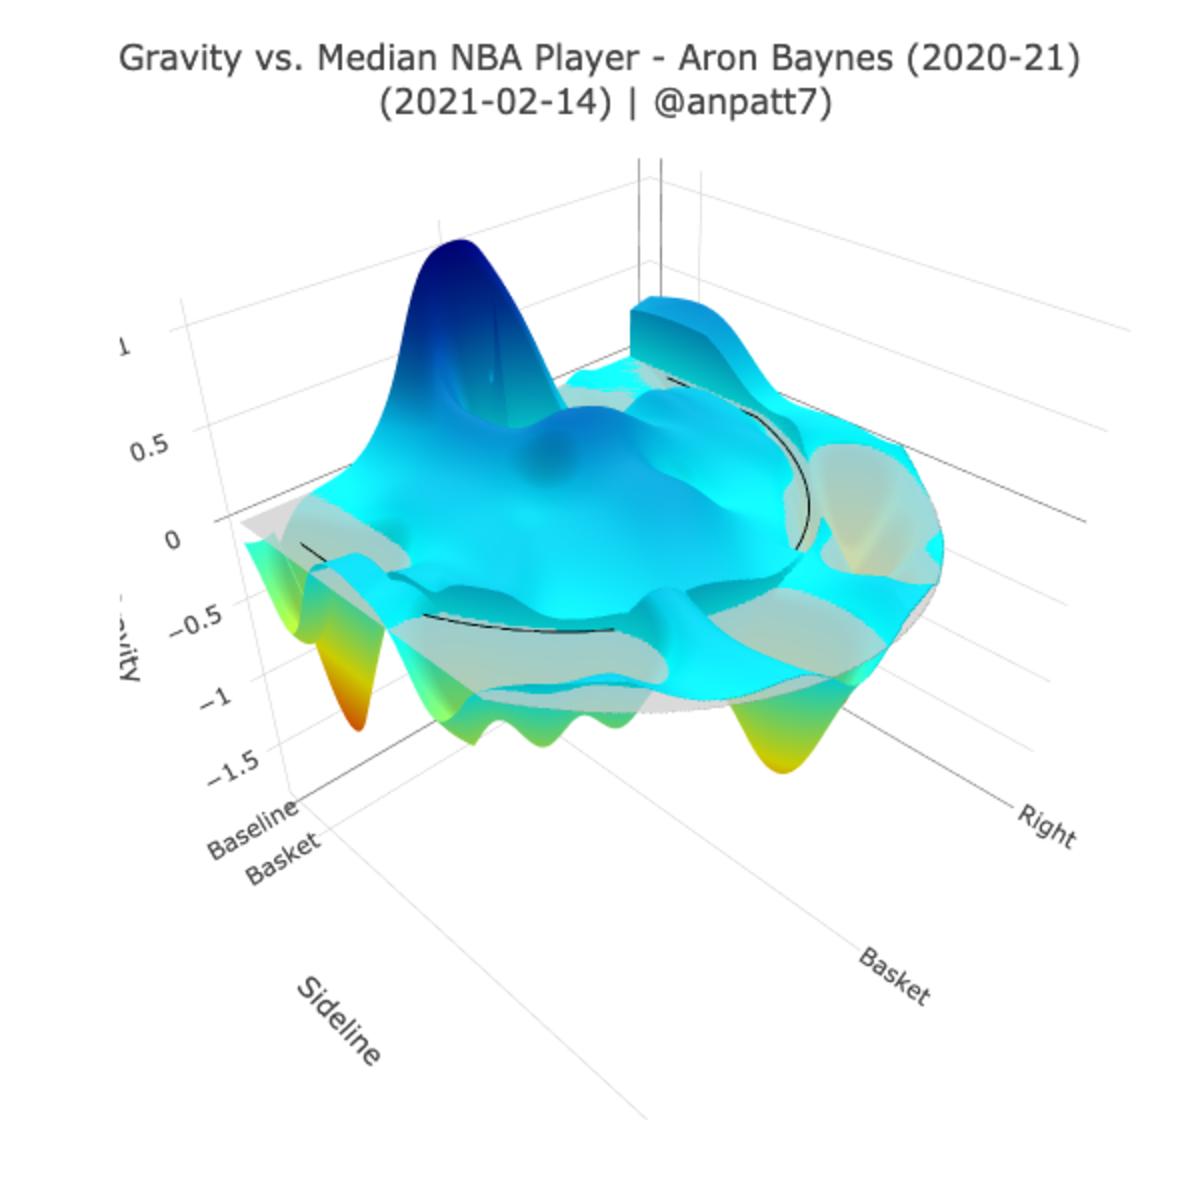 Aron Baynes' gravity chart for 2020-21